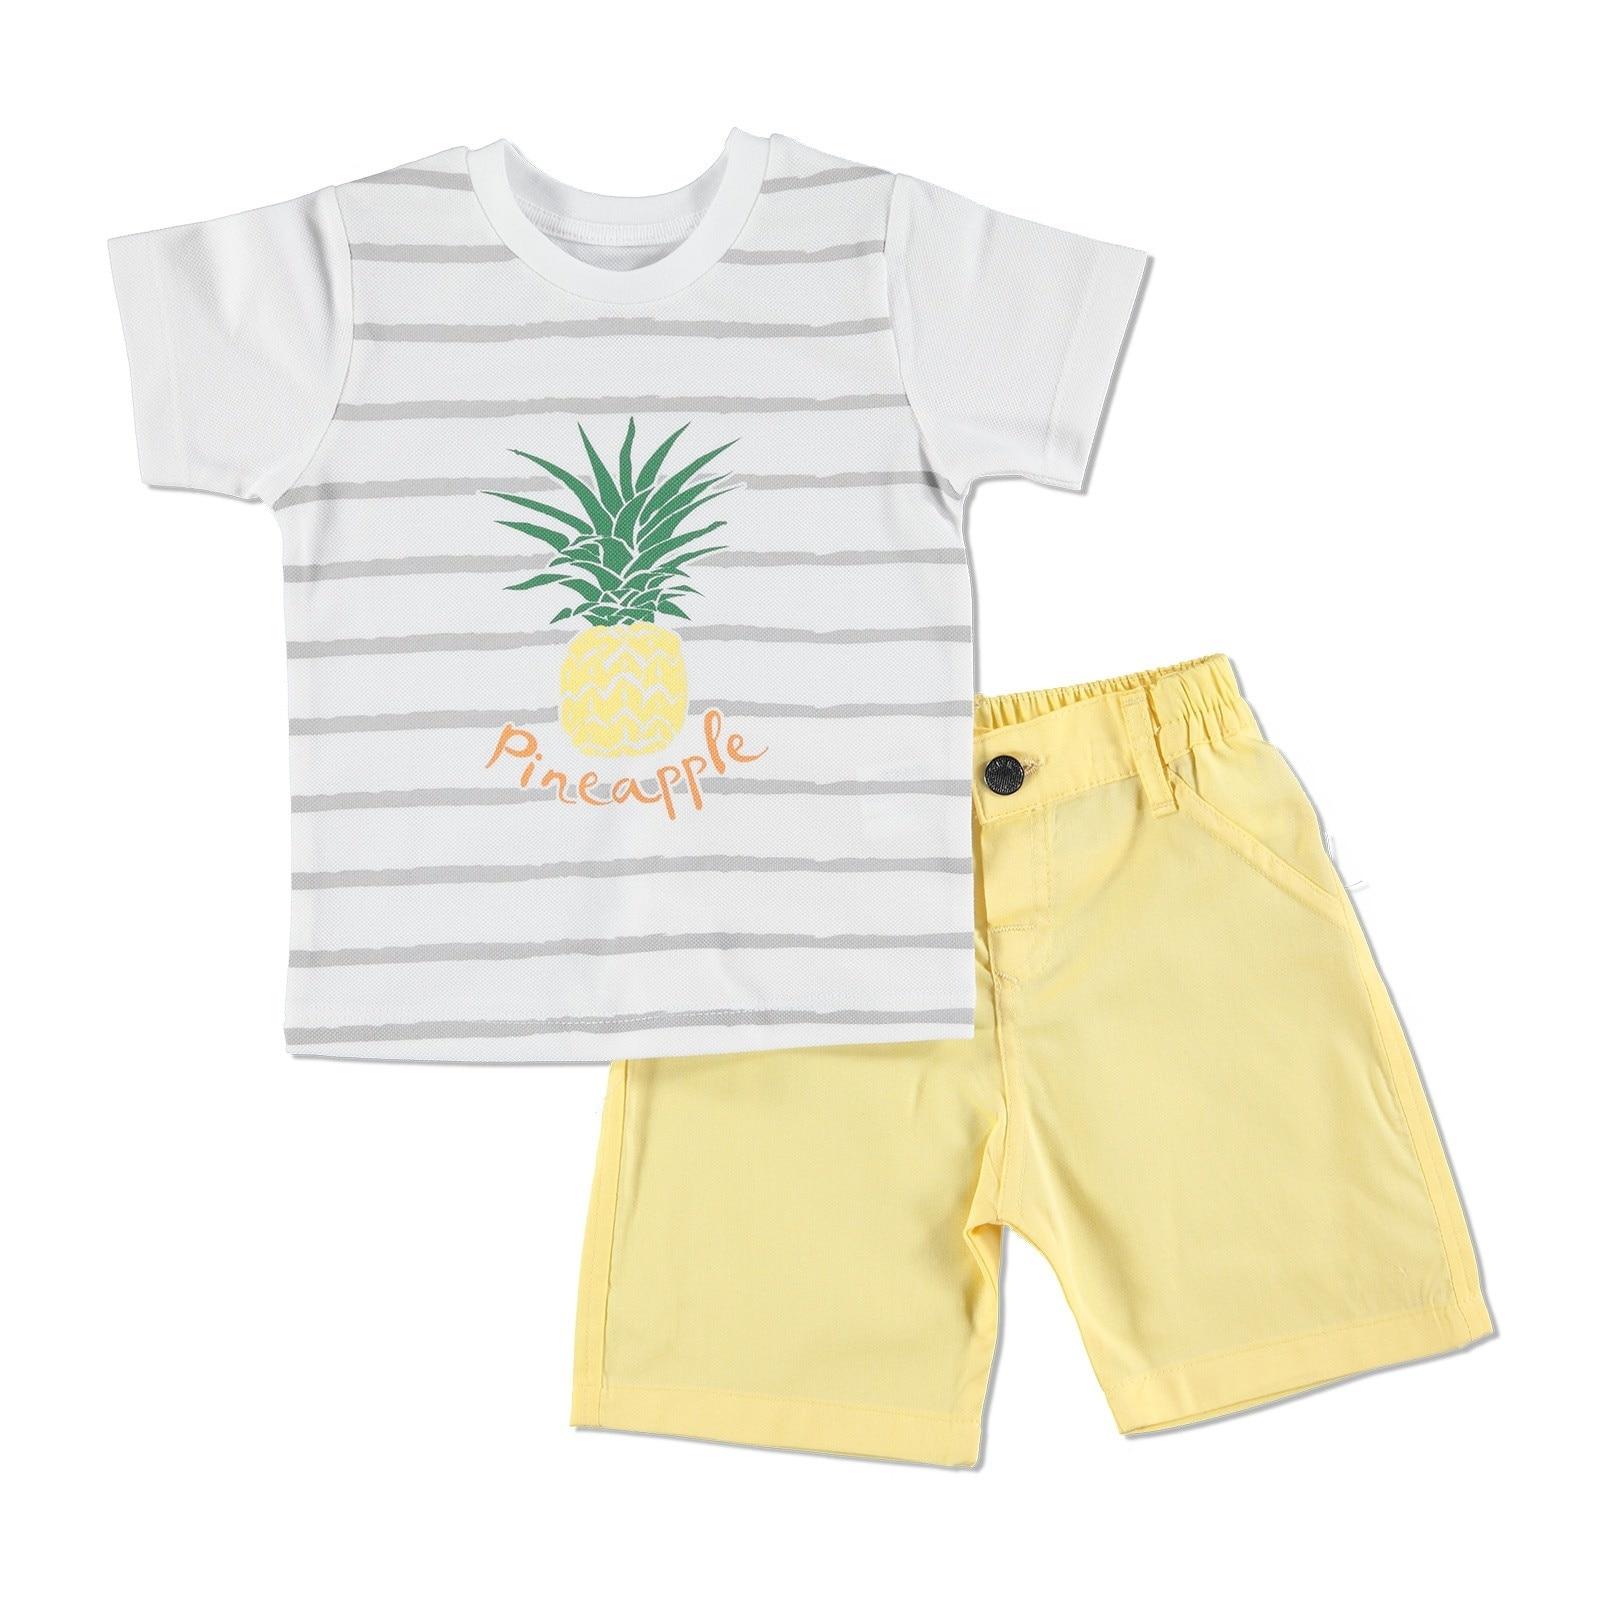 Ebebek HelloBaby Baby Boy Pineapple Theme Tshirt Short Set